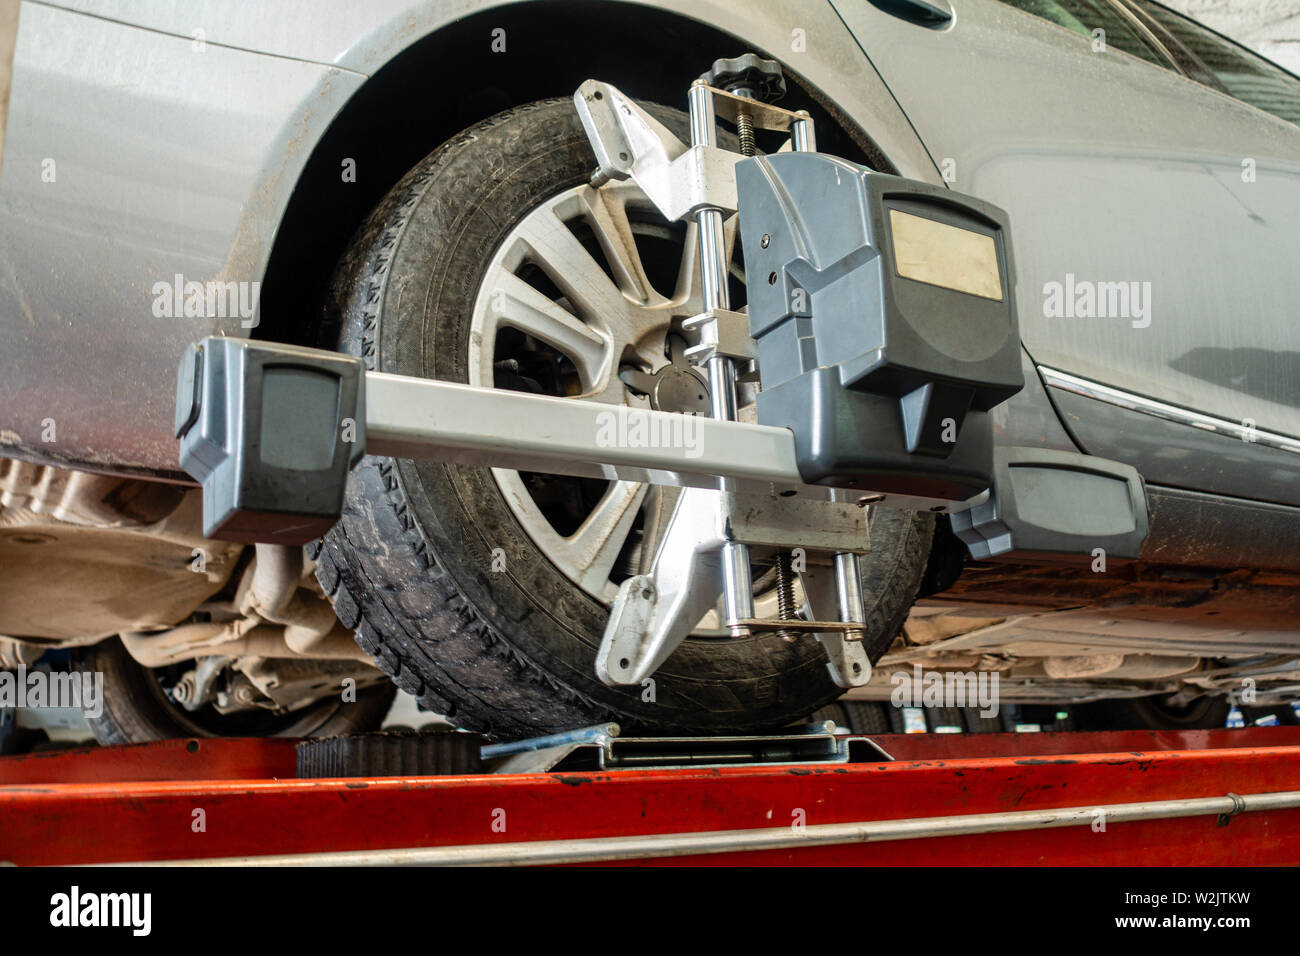 Wheel alignment tool - Stock Image